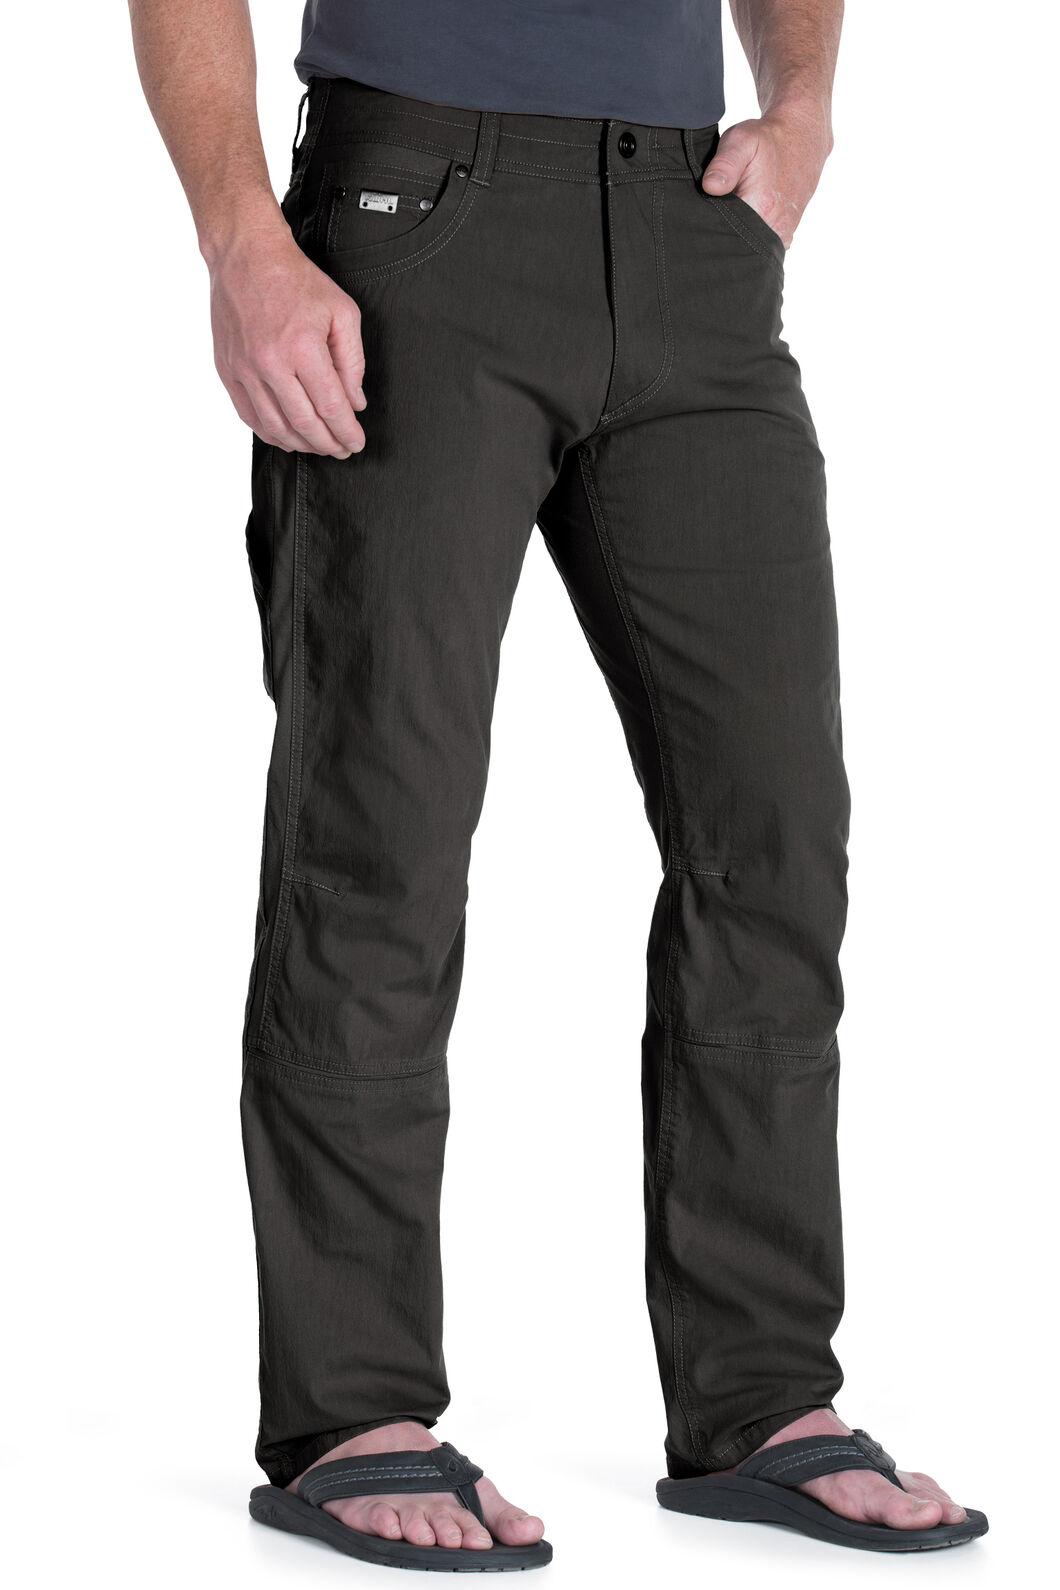 Kuhl Radikl Pants (34 inch leg) - Men's, Carbon, hi-res